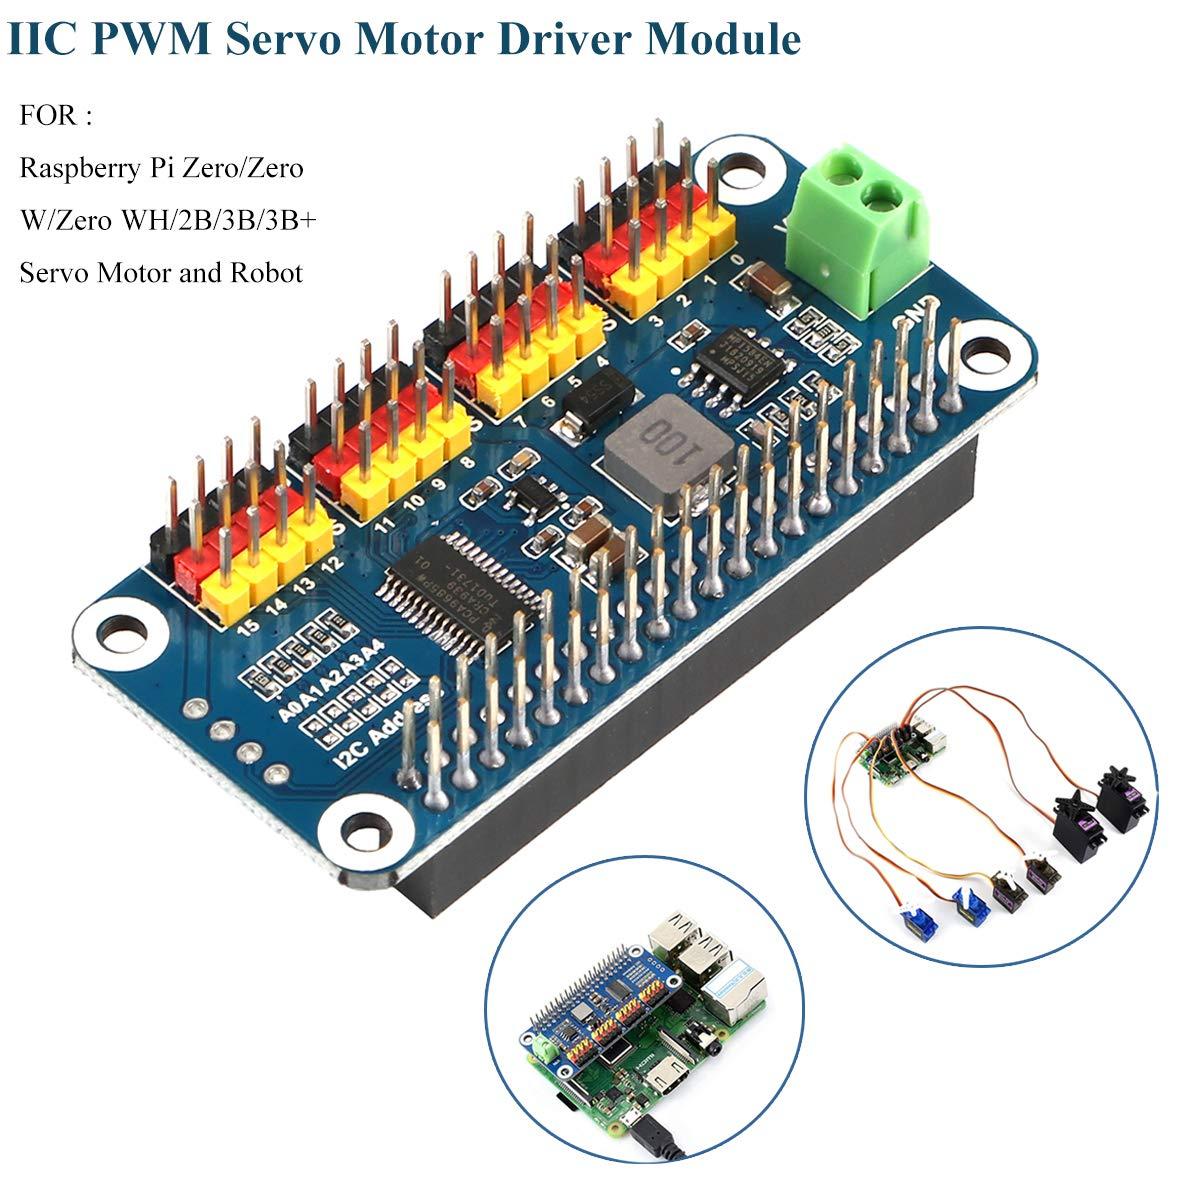 MakerHawk PWM Servo Motor Driver IIC Module 16 Channel PWM Outputs 12 Bit Resolution I2C Interface Compatible with Raspberry Pi Zero/Zero W/Zero WH/2B/3B/3B+ and Robot